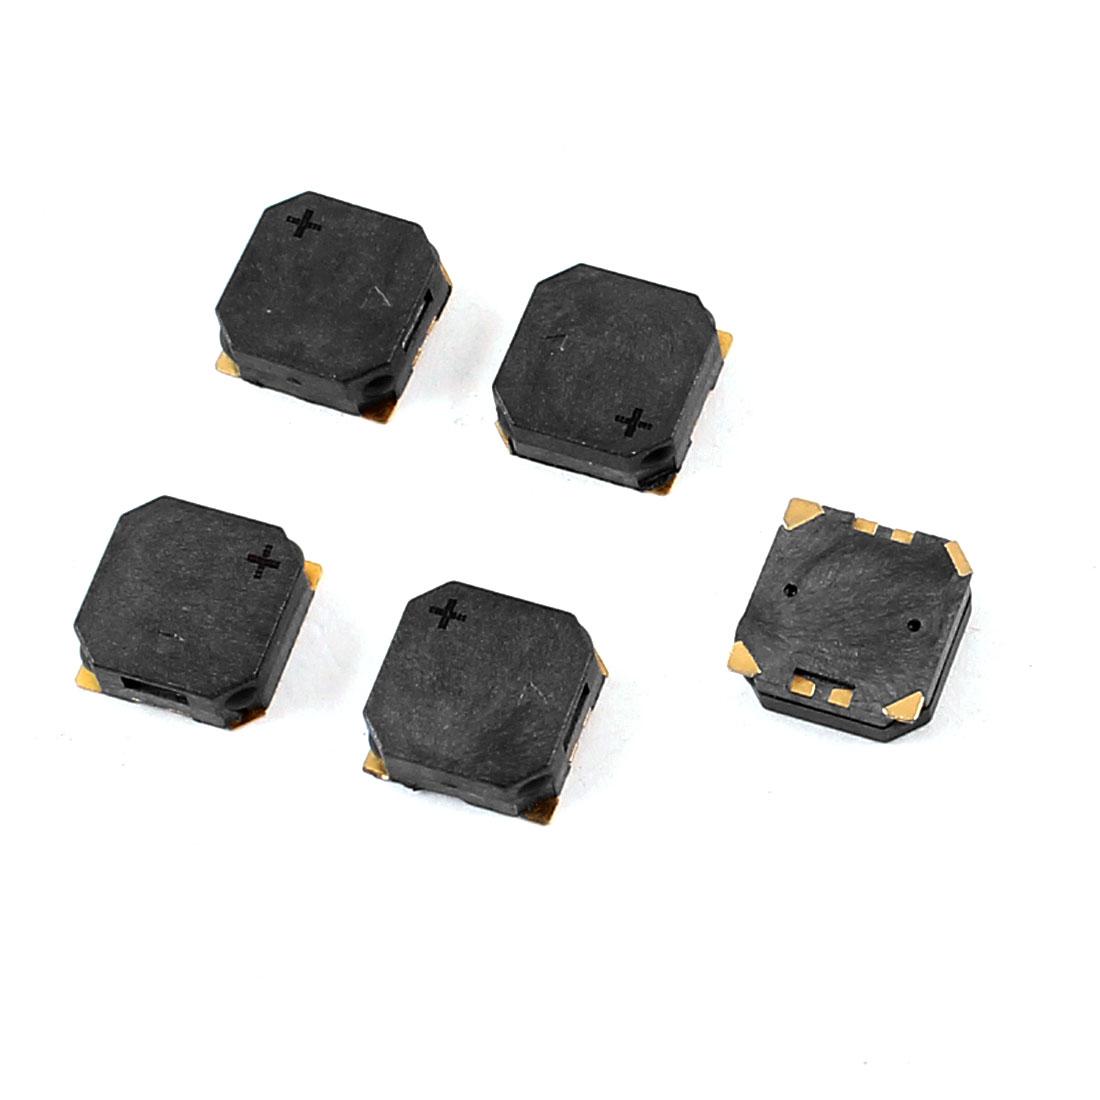 5pcs 8.5mm x 8.5mm x 3mm Square Shape SMD Passive Buzzer DC 3.6V 90mA 2500 Hz